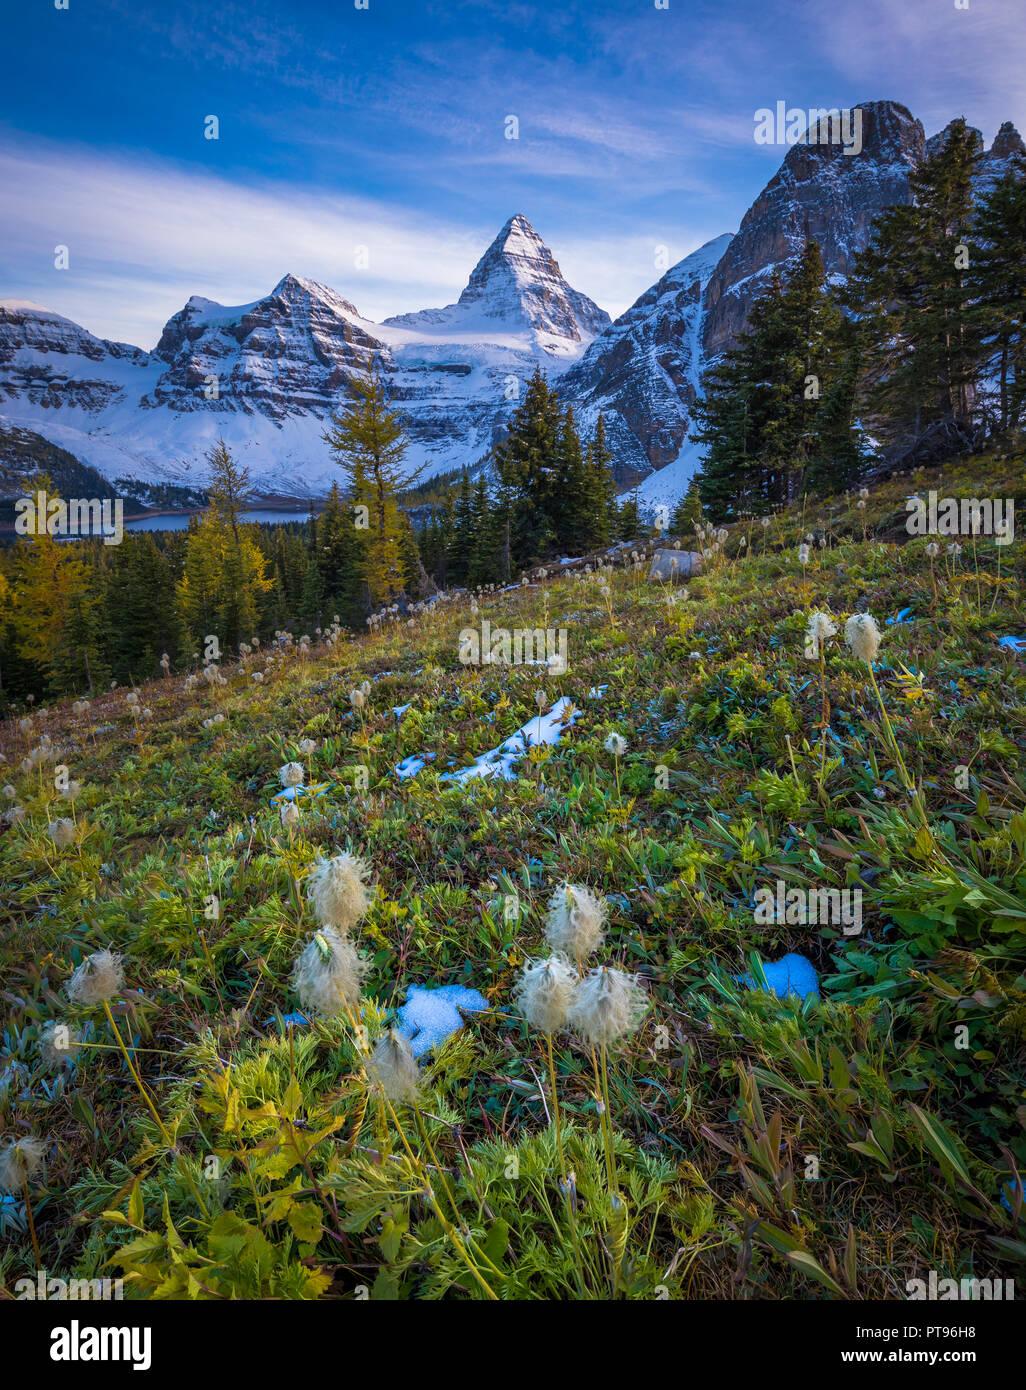 Mount Assiniboine, also known asAssiniboine Mountain, is apyramidal peakmountainlocated on theGreat Divide, on theBritish Columbia/Albertaborde - Stock Image